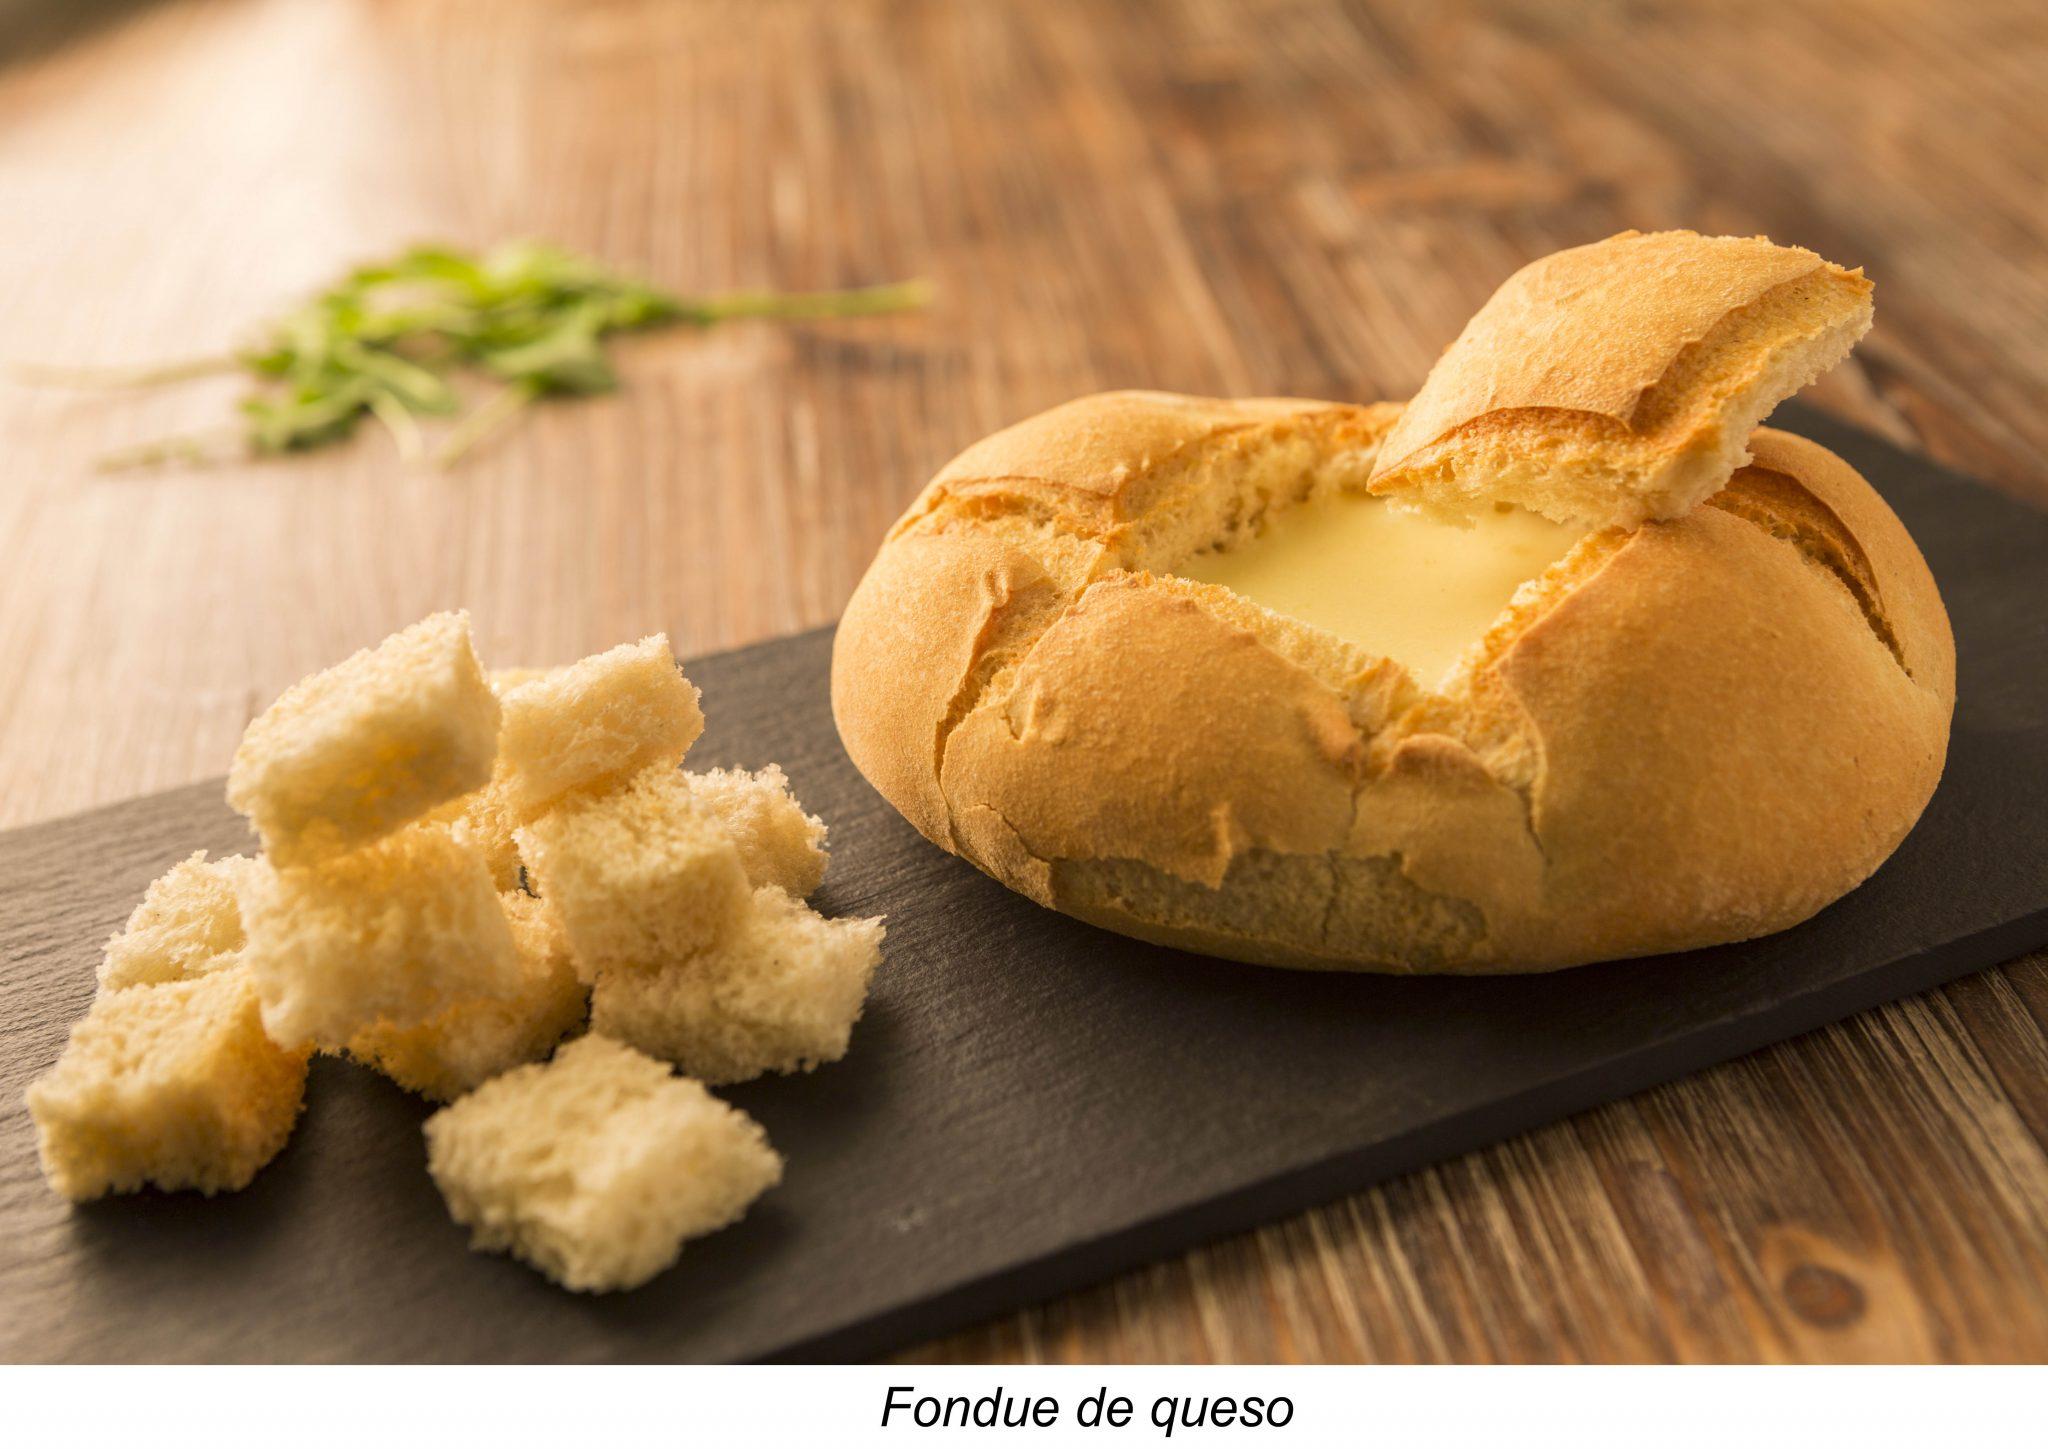 03. Fondue de queso